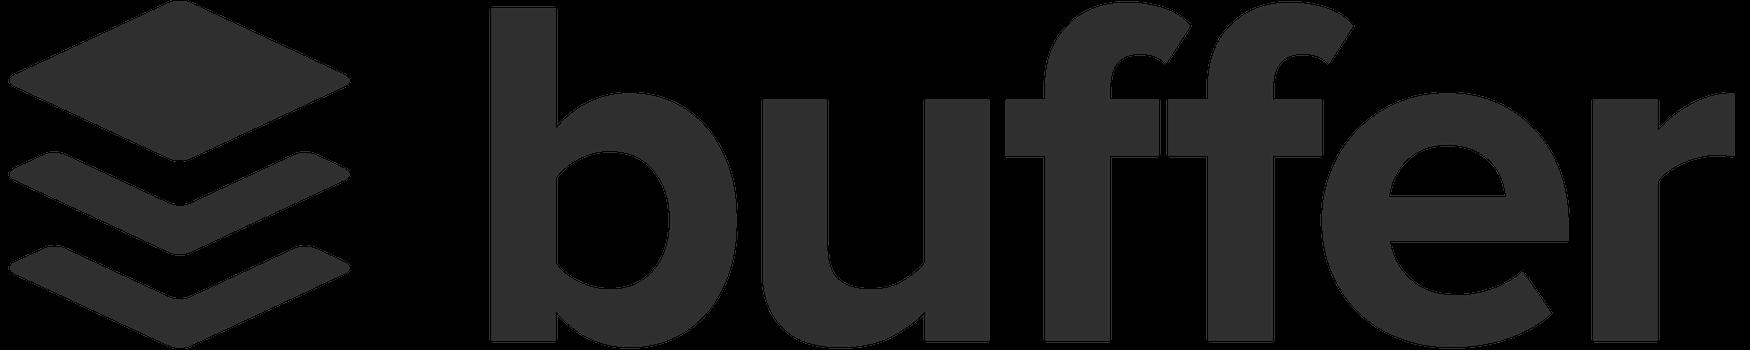 Image result for buffer